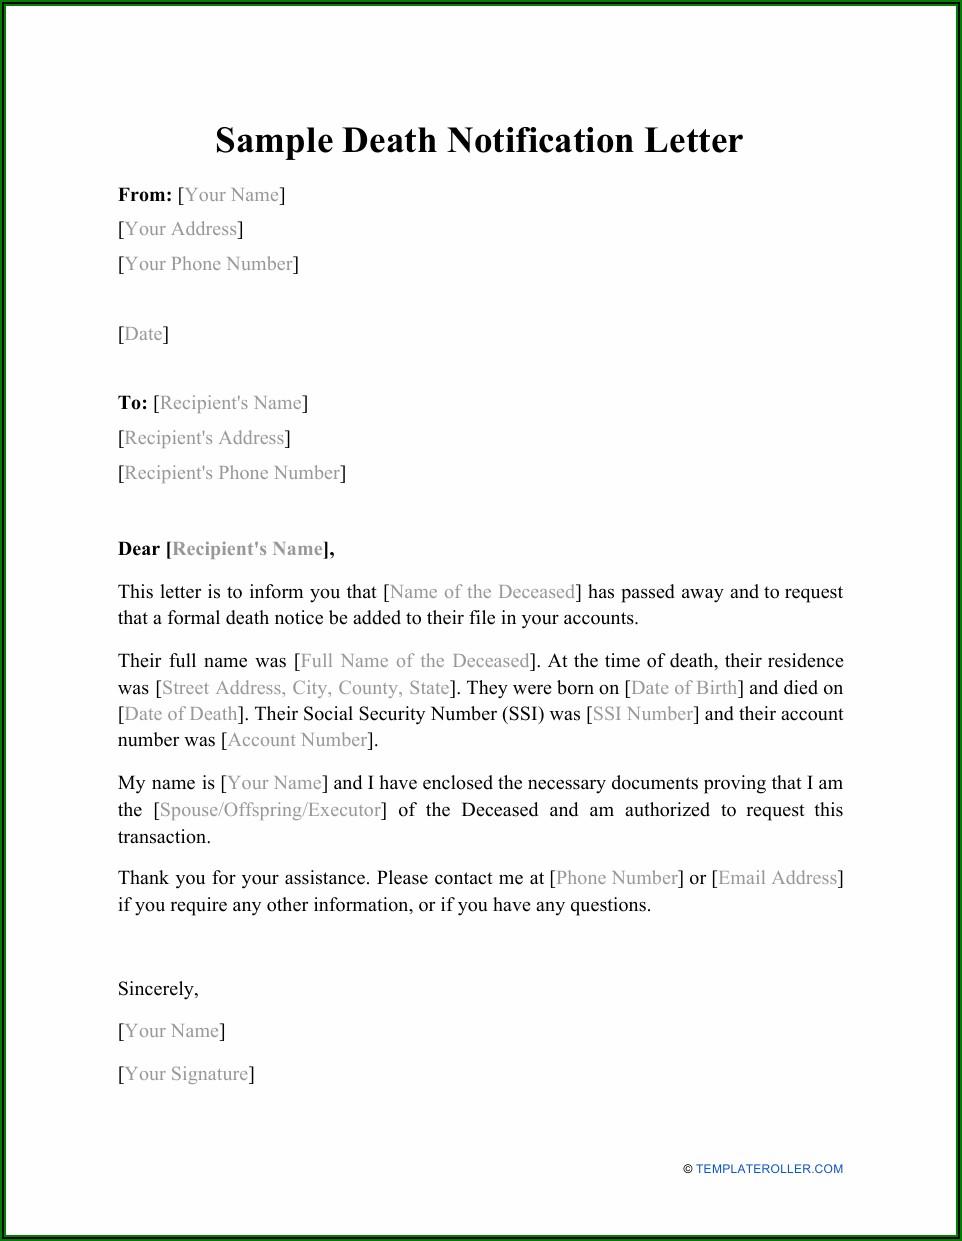 Death Notification Letter Sample